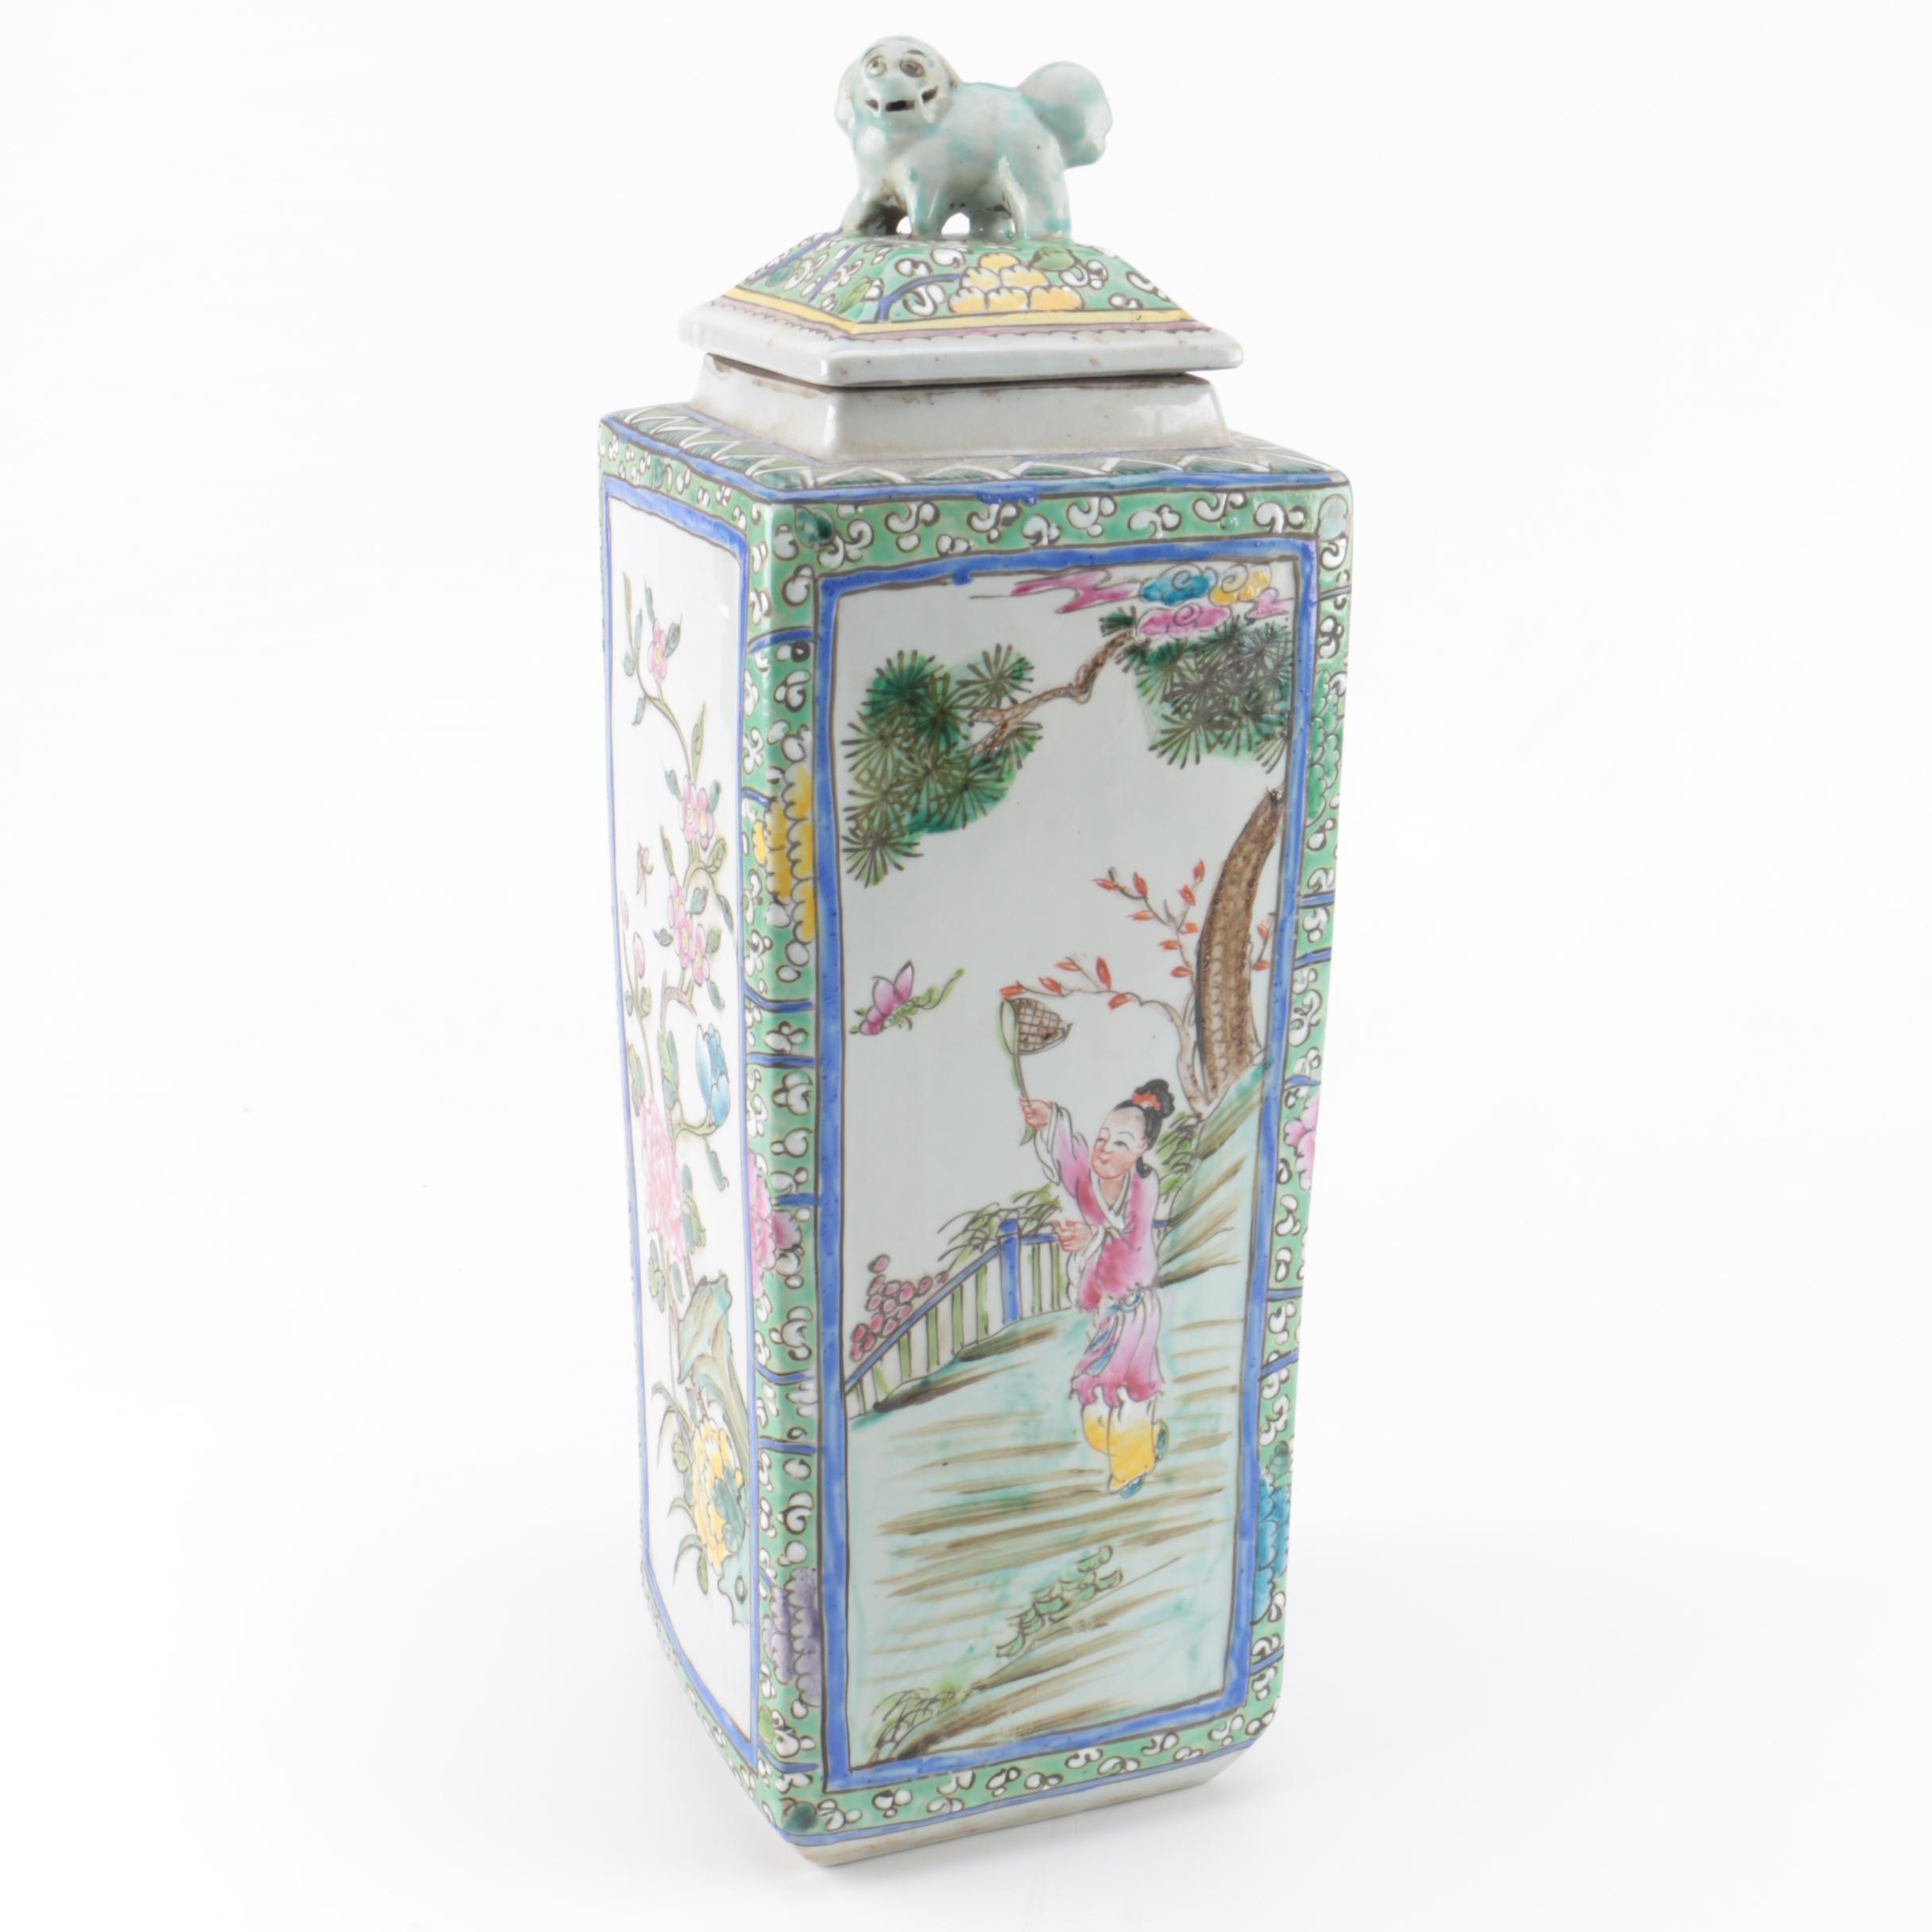 Chinese Rectangular Lidded Jar